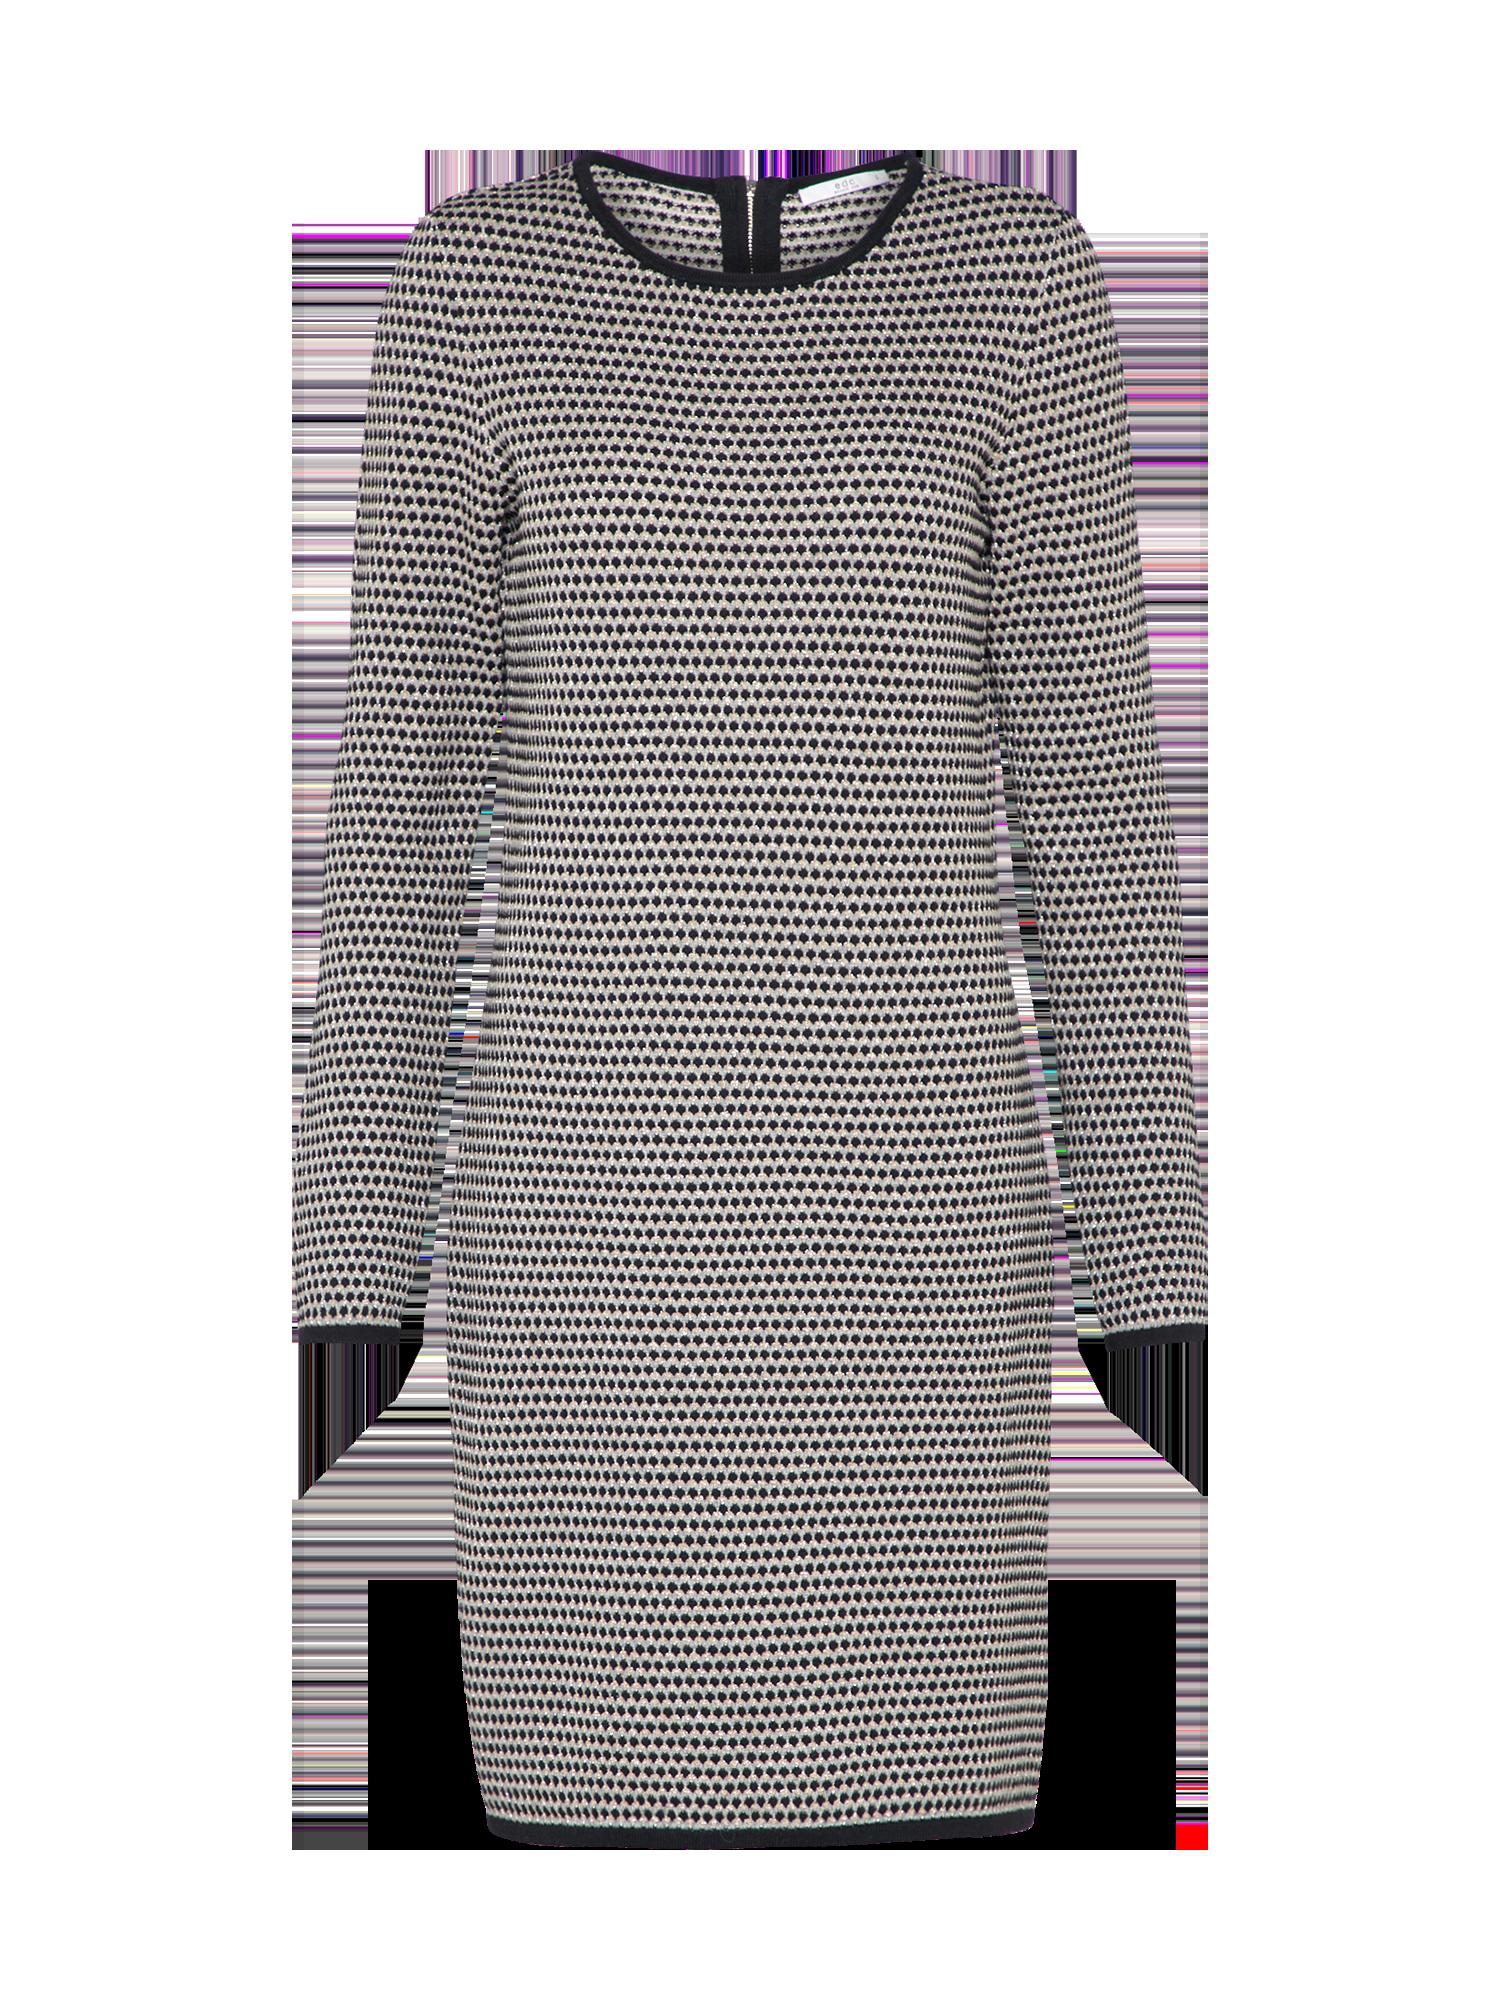 EDC  BY  ESPRIT,Esprit  Damen  Kleid  patterned  grau,  weiß ... ec49a3b30e